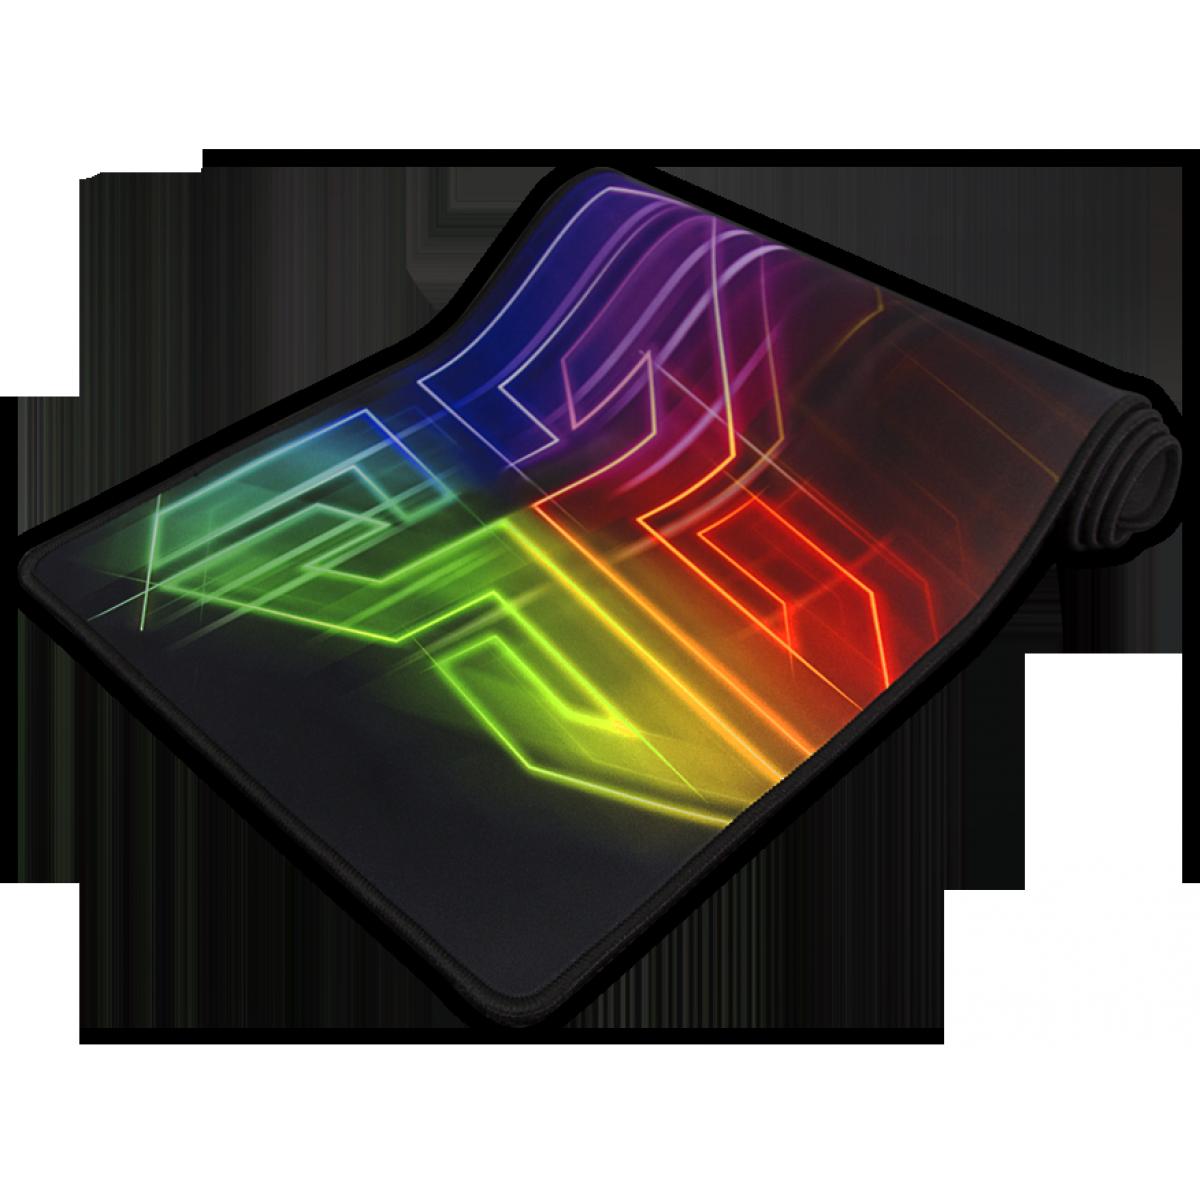 Mousepad Gamer Fantech Vigil, Black, 900x300mm, MP902